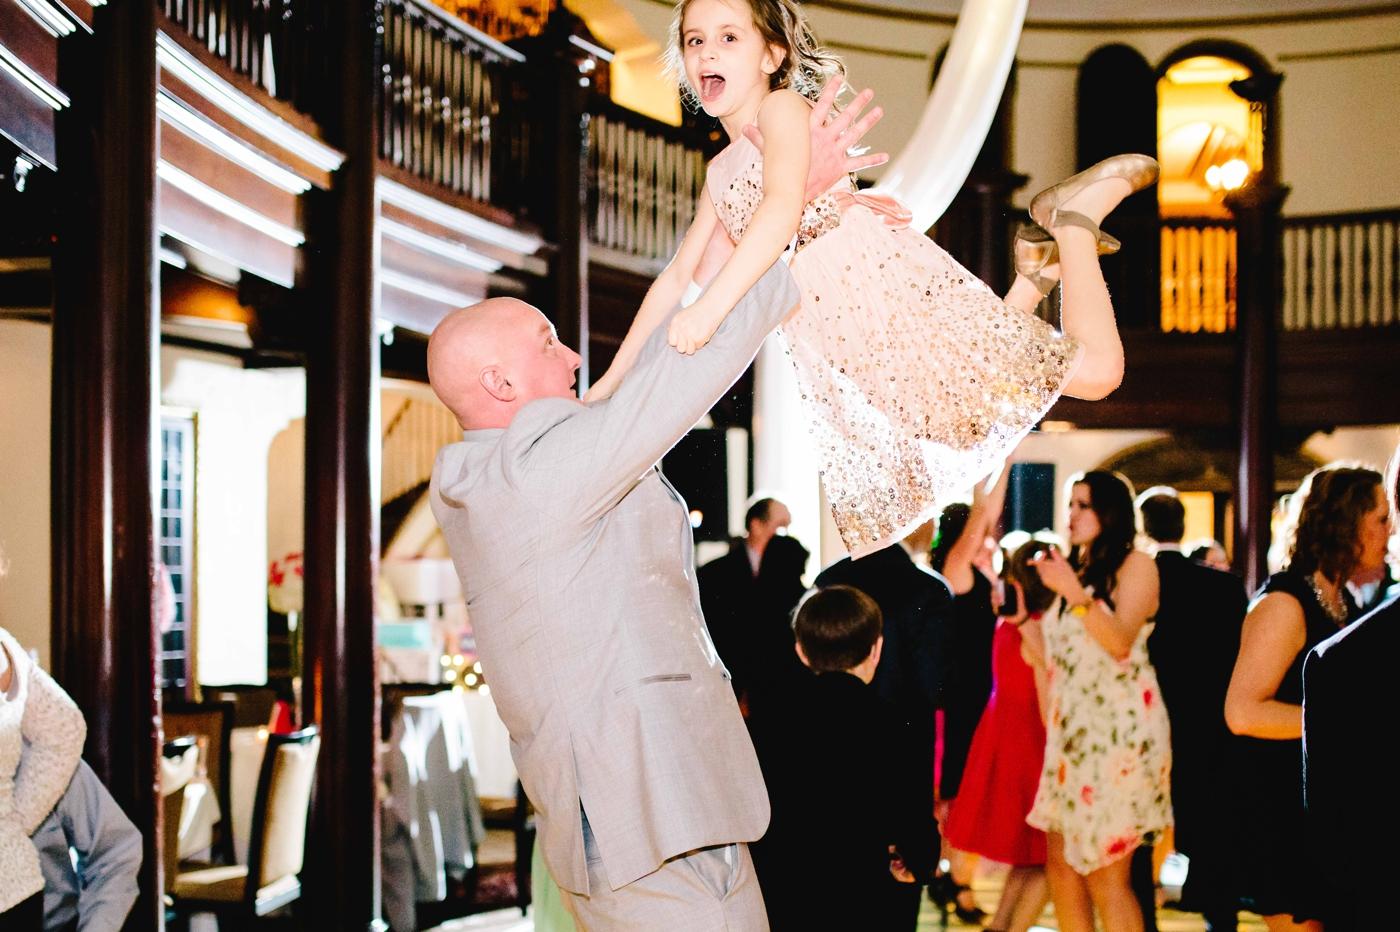 chicago-fine-art-wedding-photography-cassady26